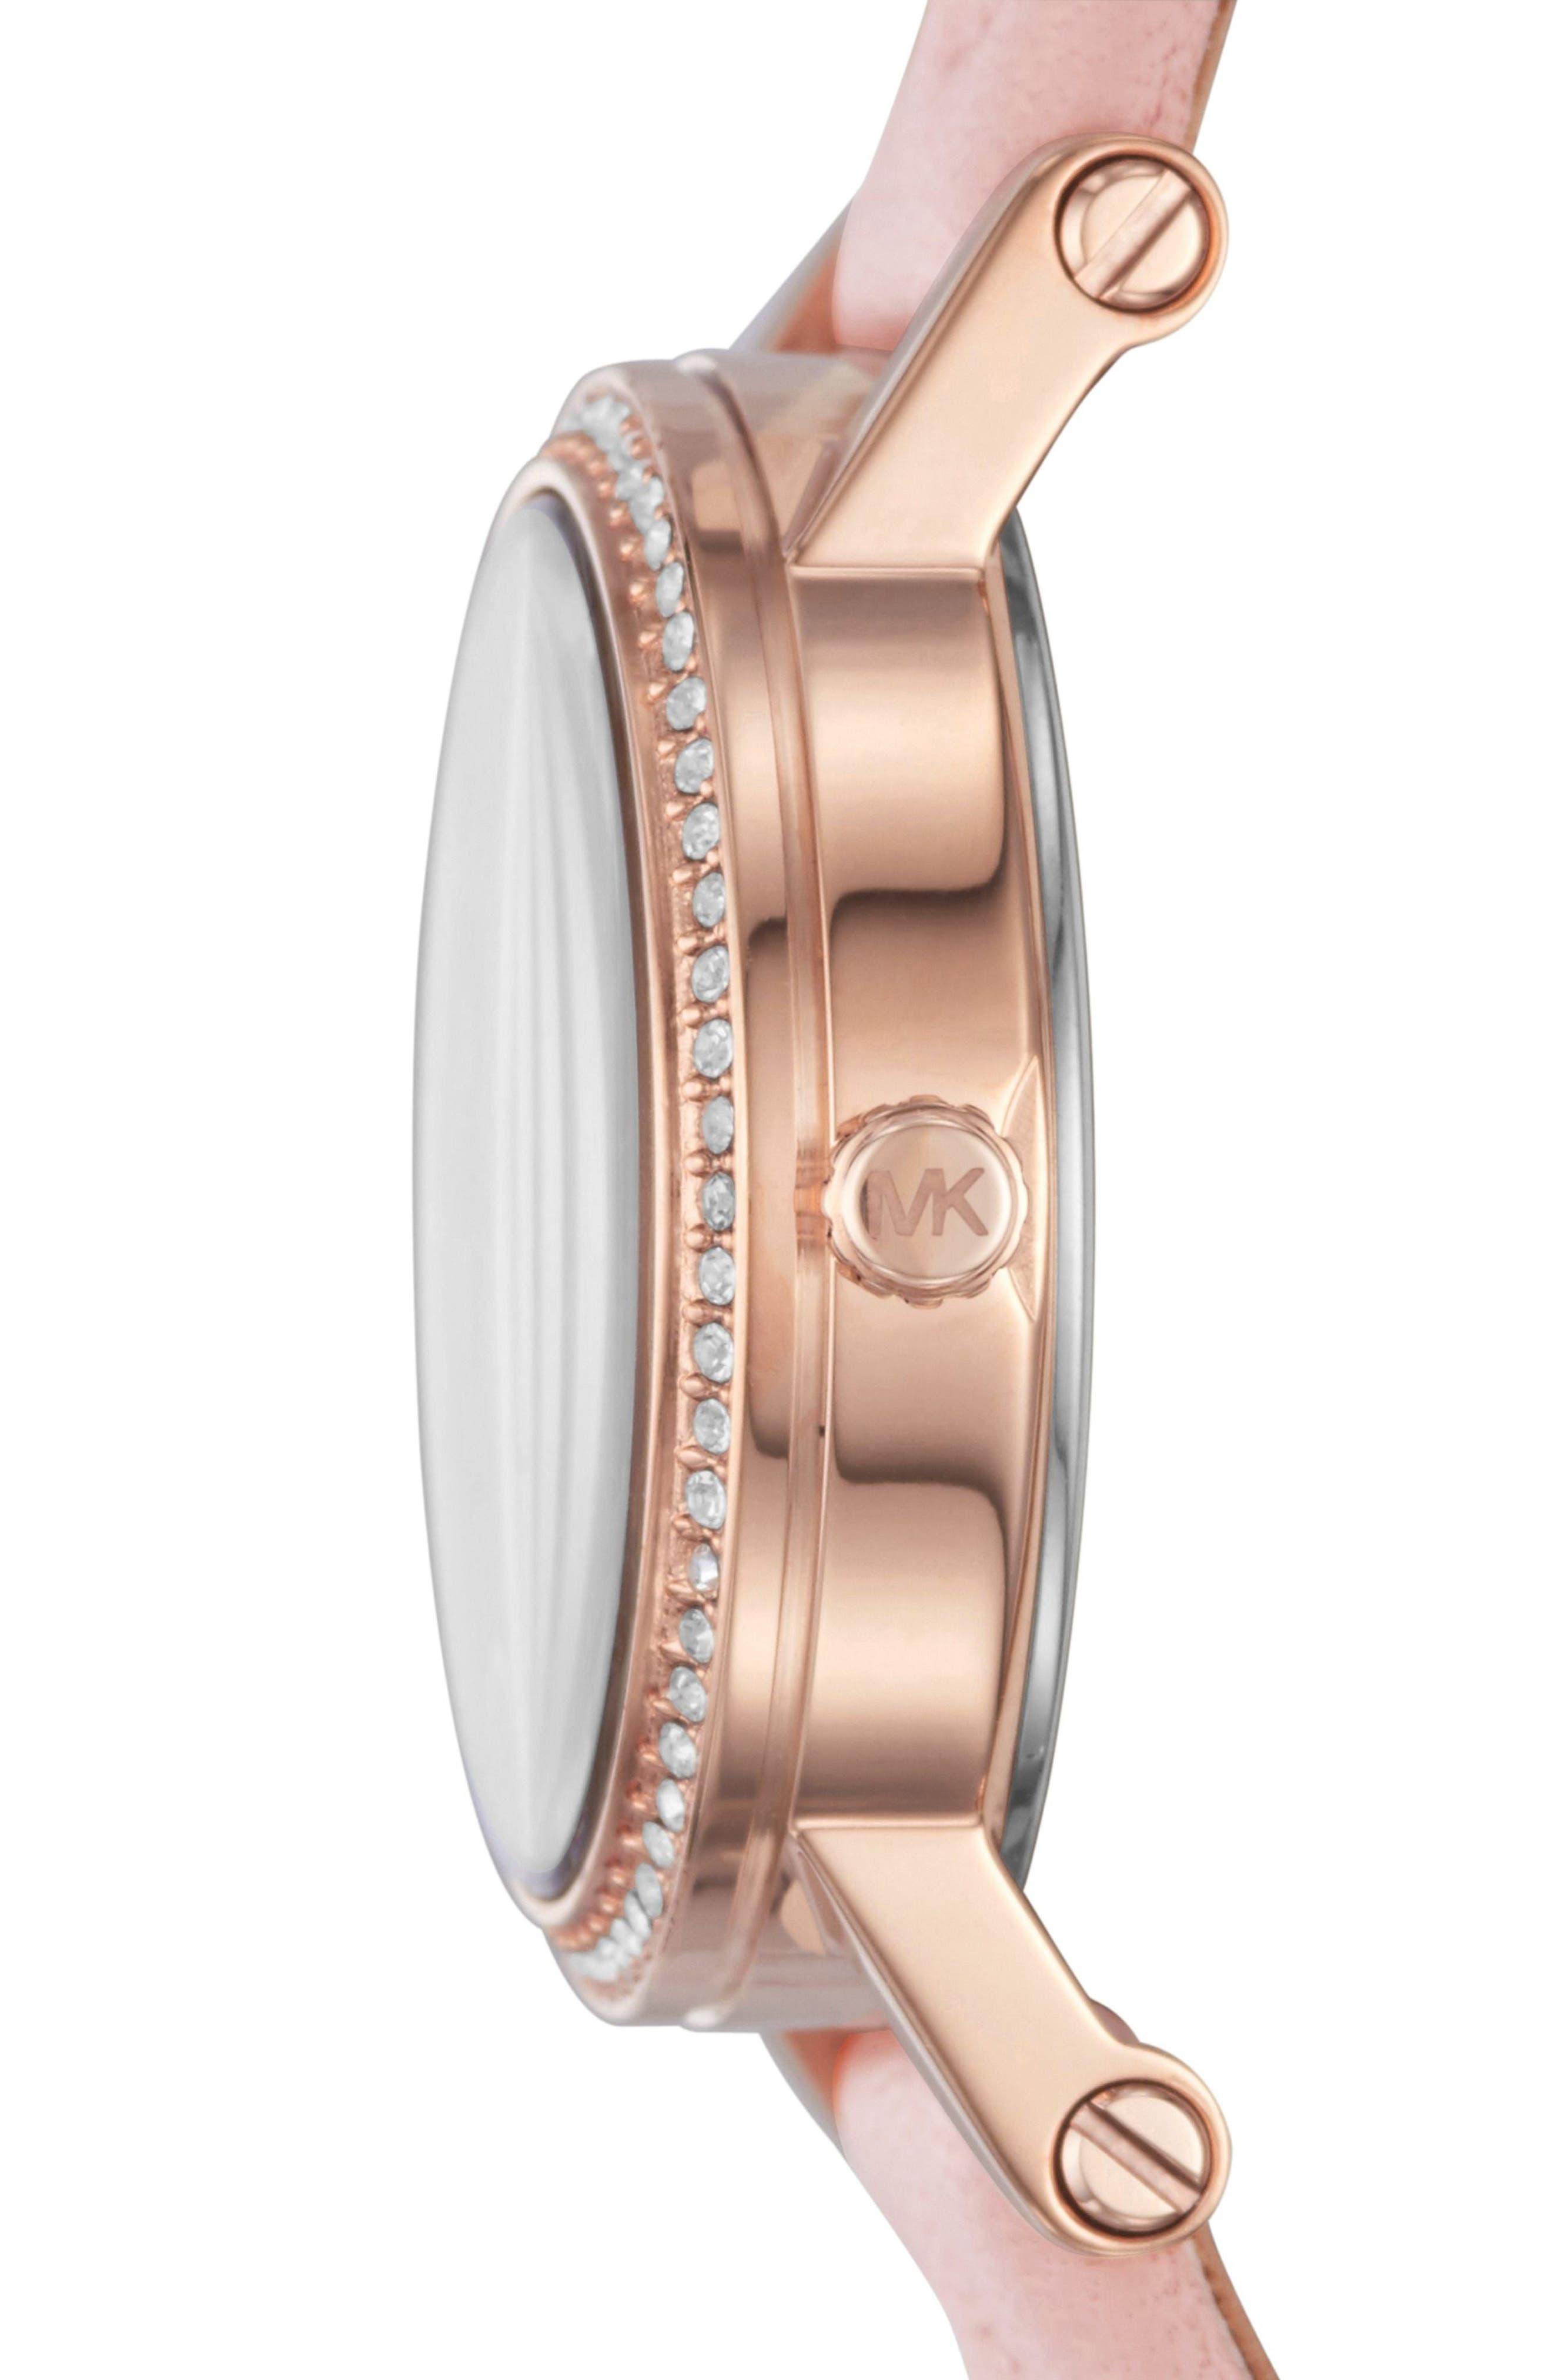 MICHAEL Michael Kors Petite Norie Crystal Accent Leather Strap Watch, 28mm,                             Alternate thumbnail 2, color,                             650